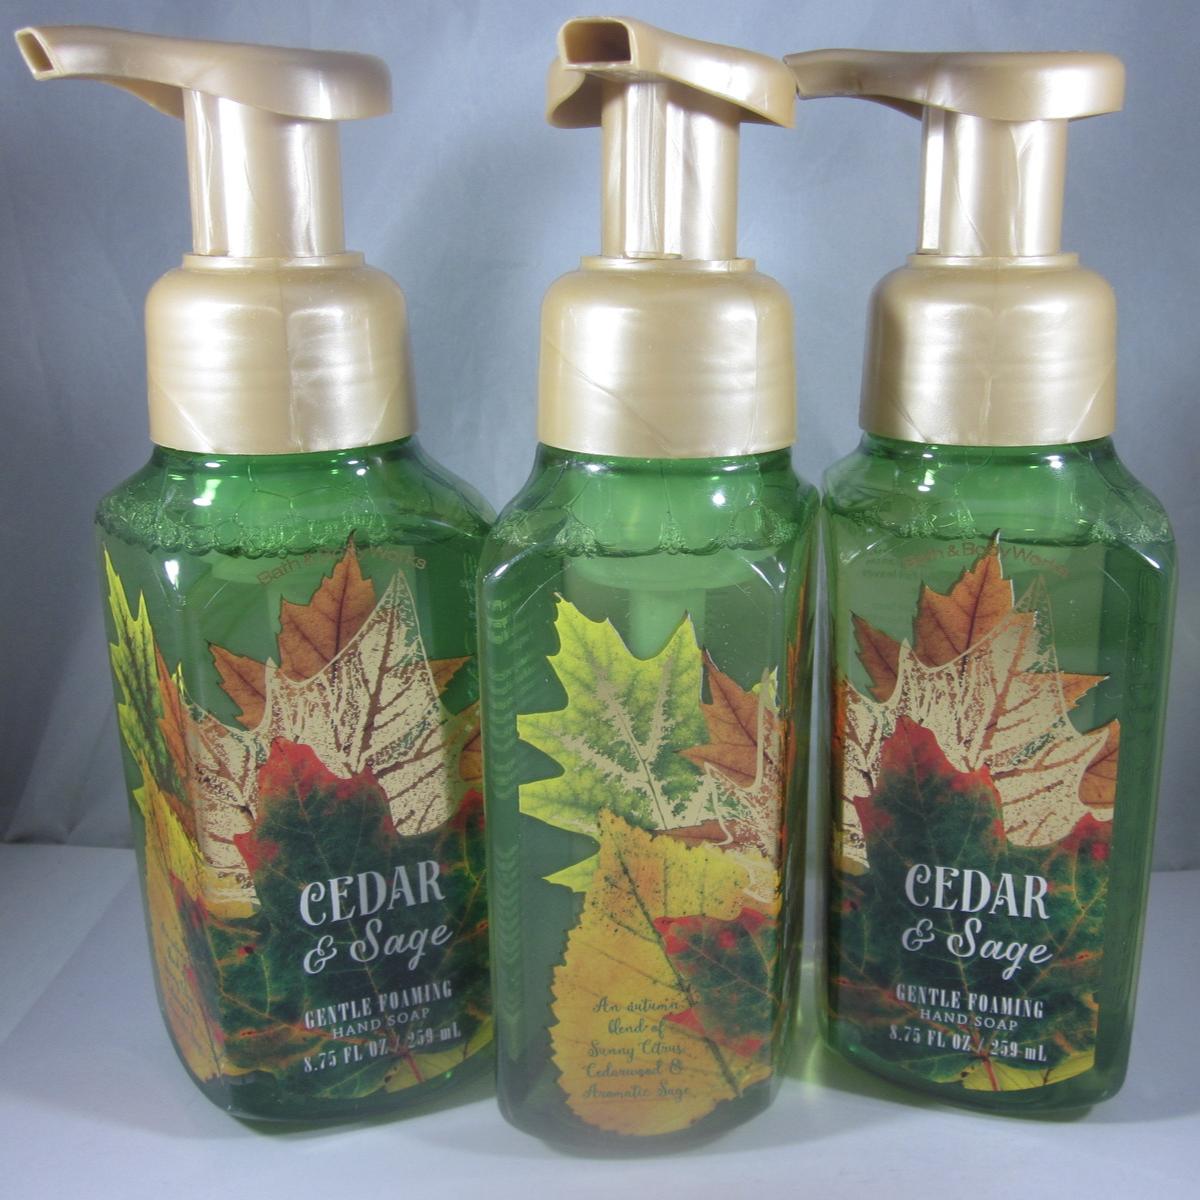 3  Bath & Body Works Gentle Foaming Hand Soap citrus cedarwood  Cedar & Sage - $69.99